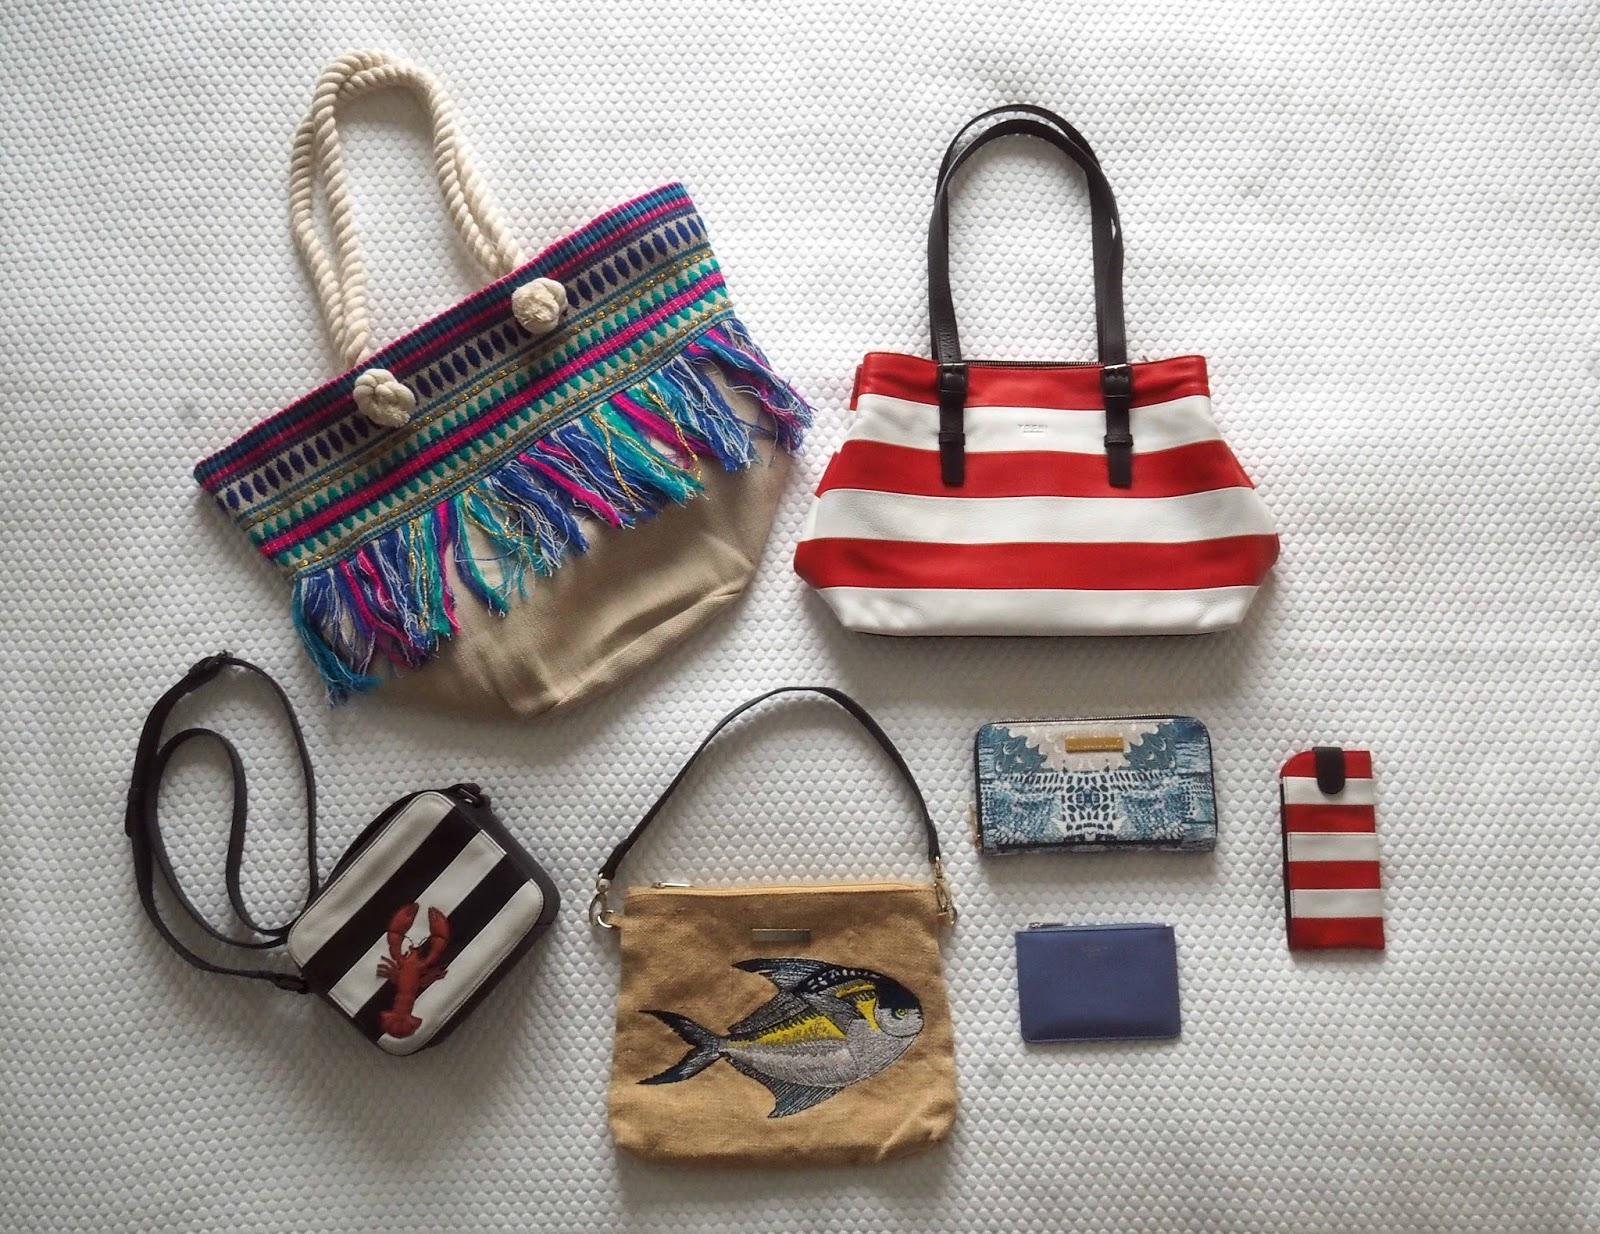 Nerja-holiday-packing-handbag-beach-bag-clutch-pouch-purse